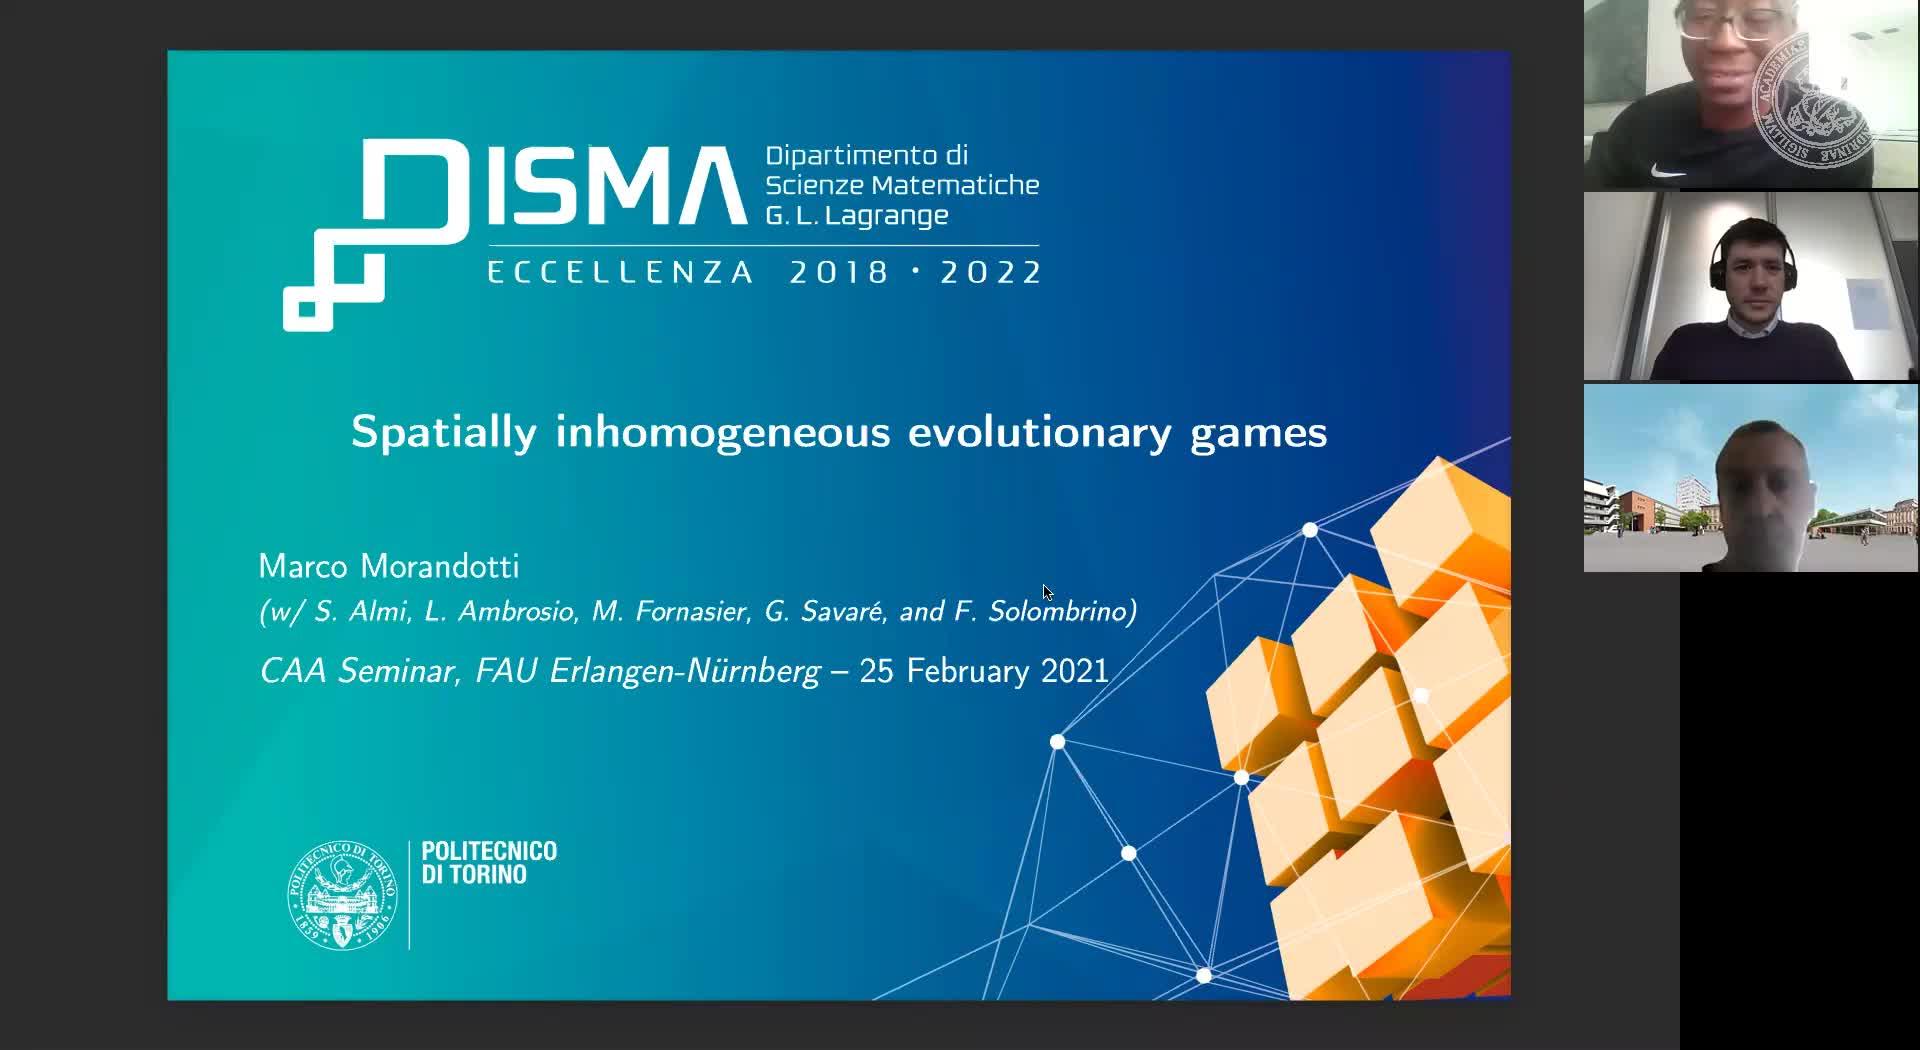 Spatially inhomogeneous evolutionary games (M. Morandotti, Politecnico di Torino preview image